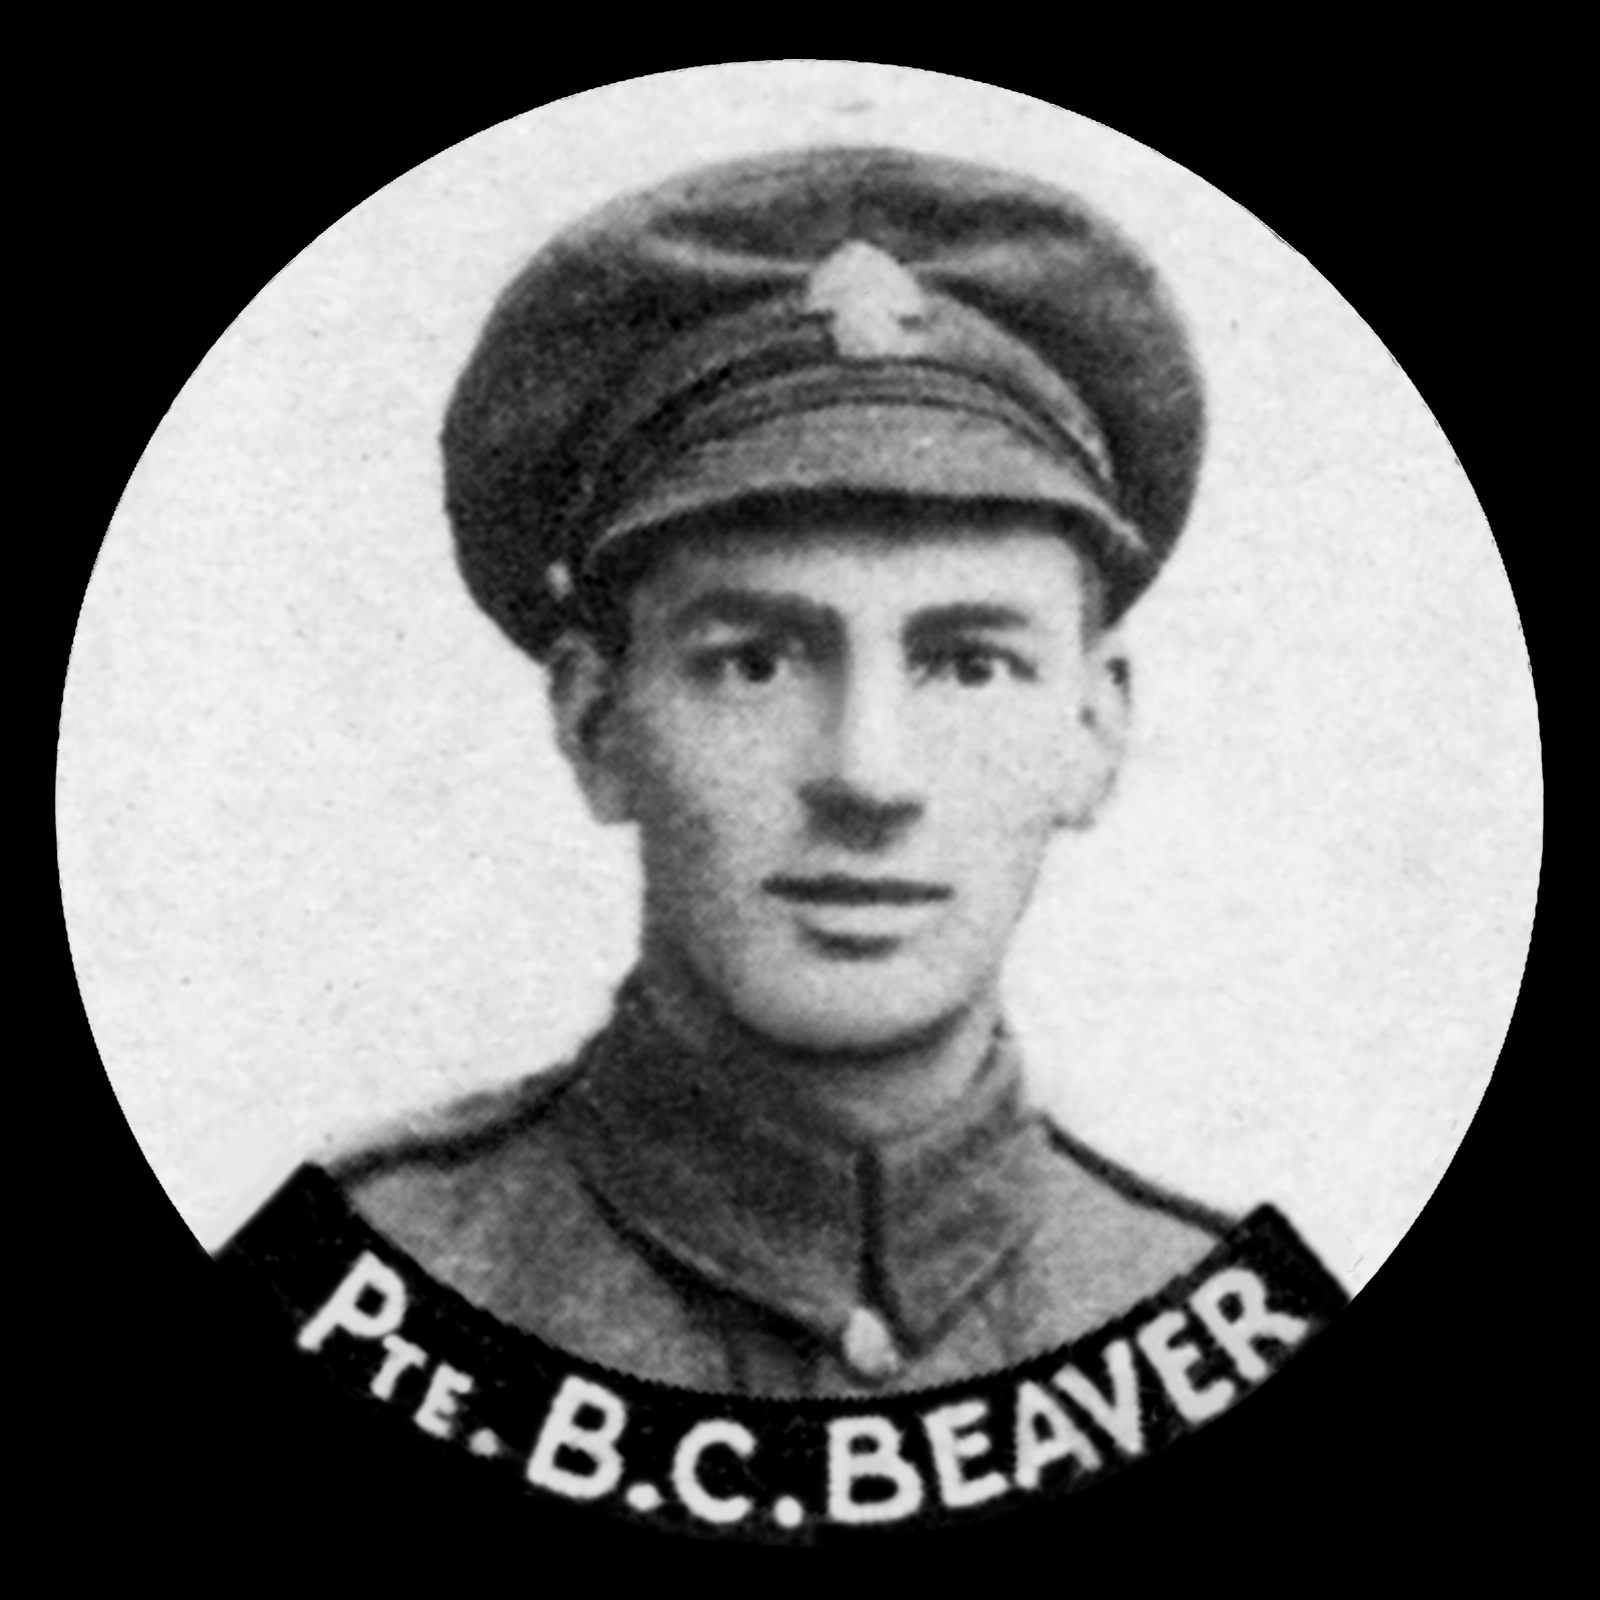 BEAVER Bernard Charles